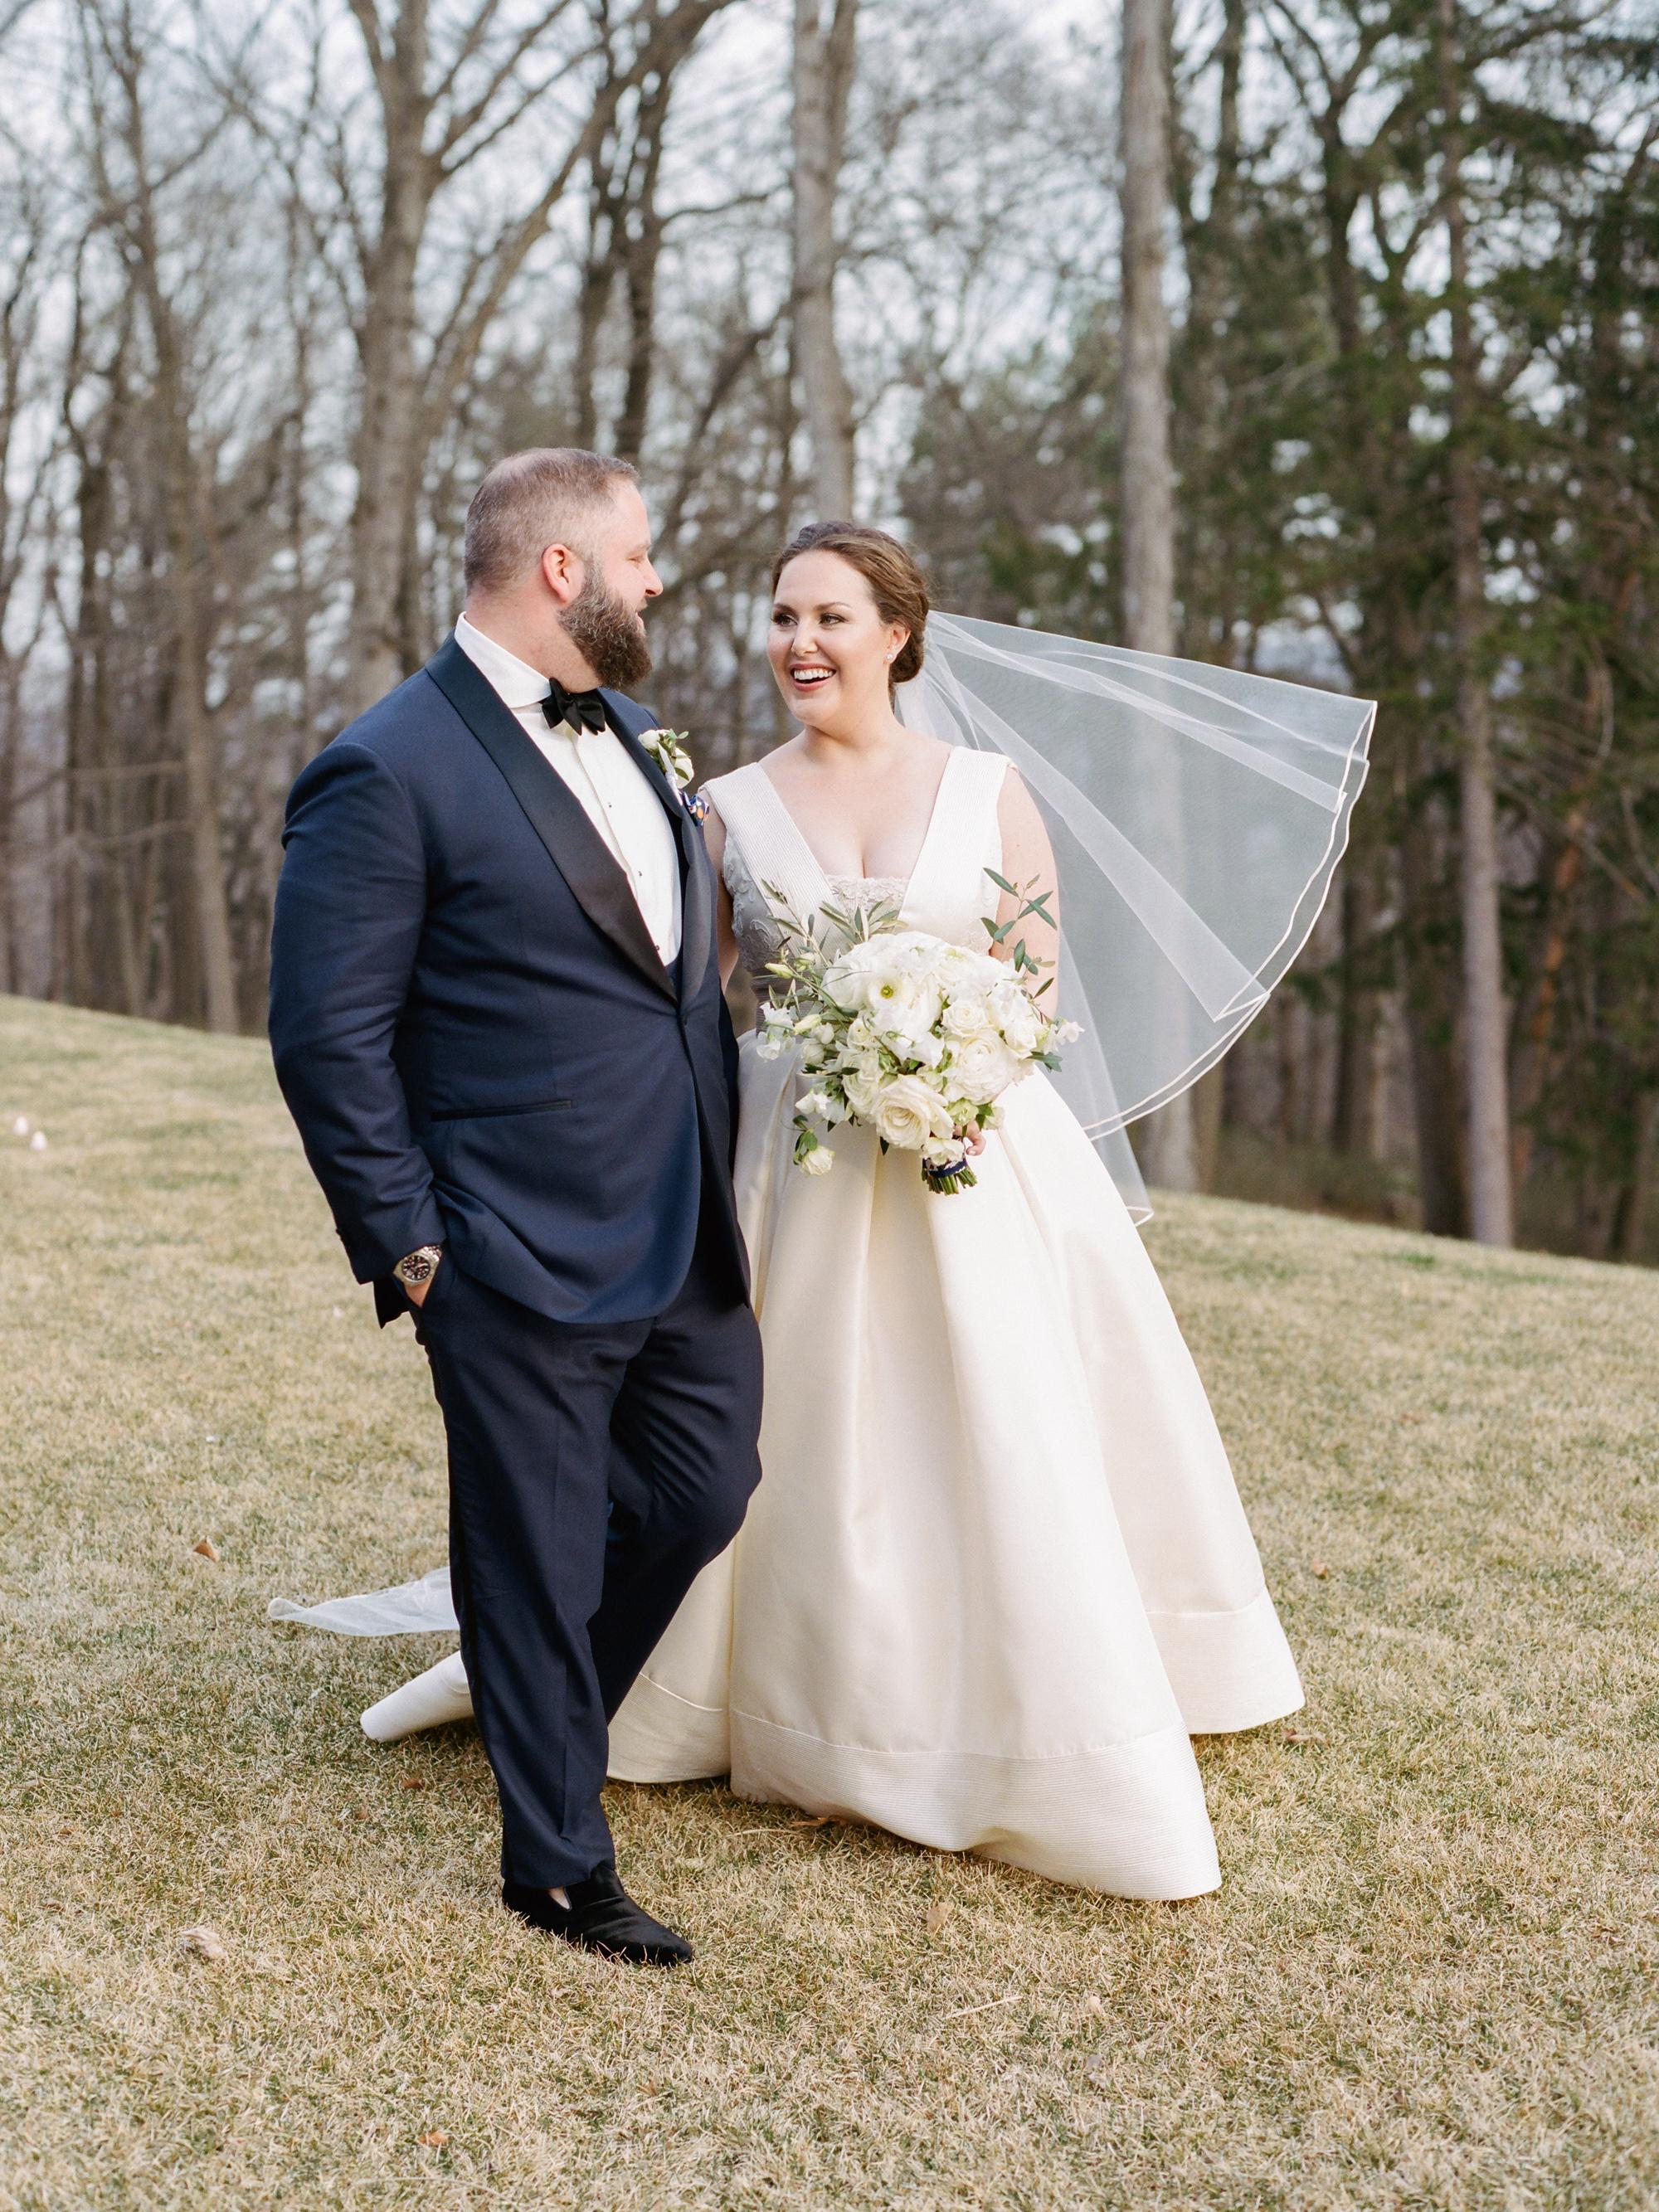 kelly drew new jersey wedding couple walking outdoors